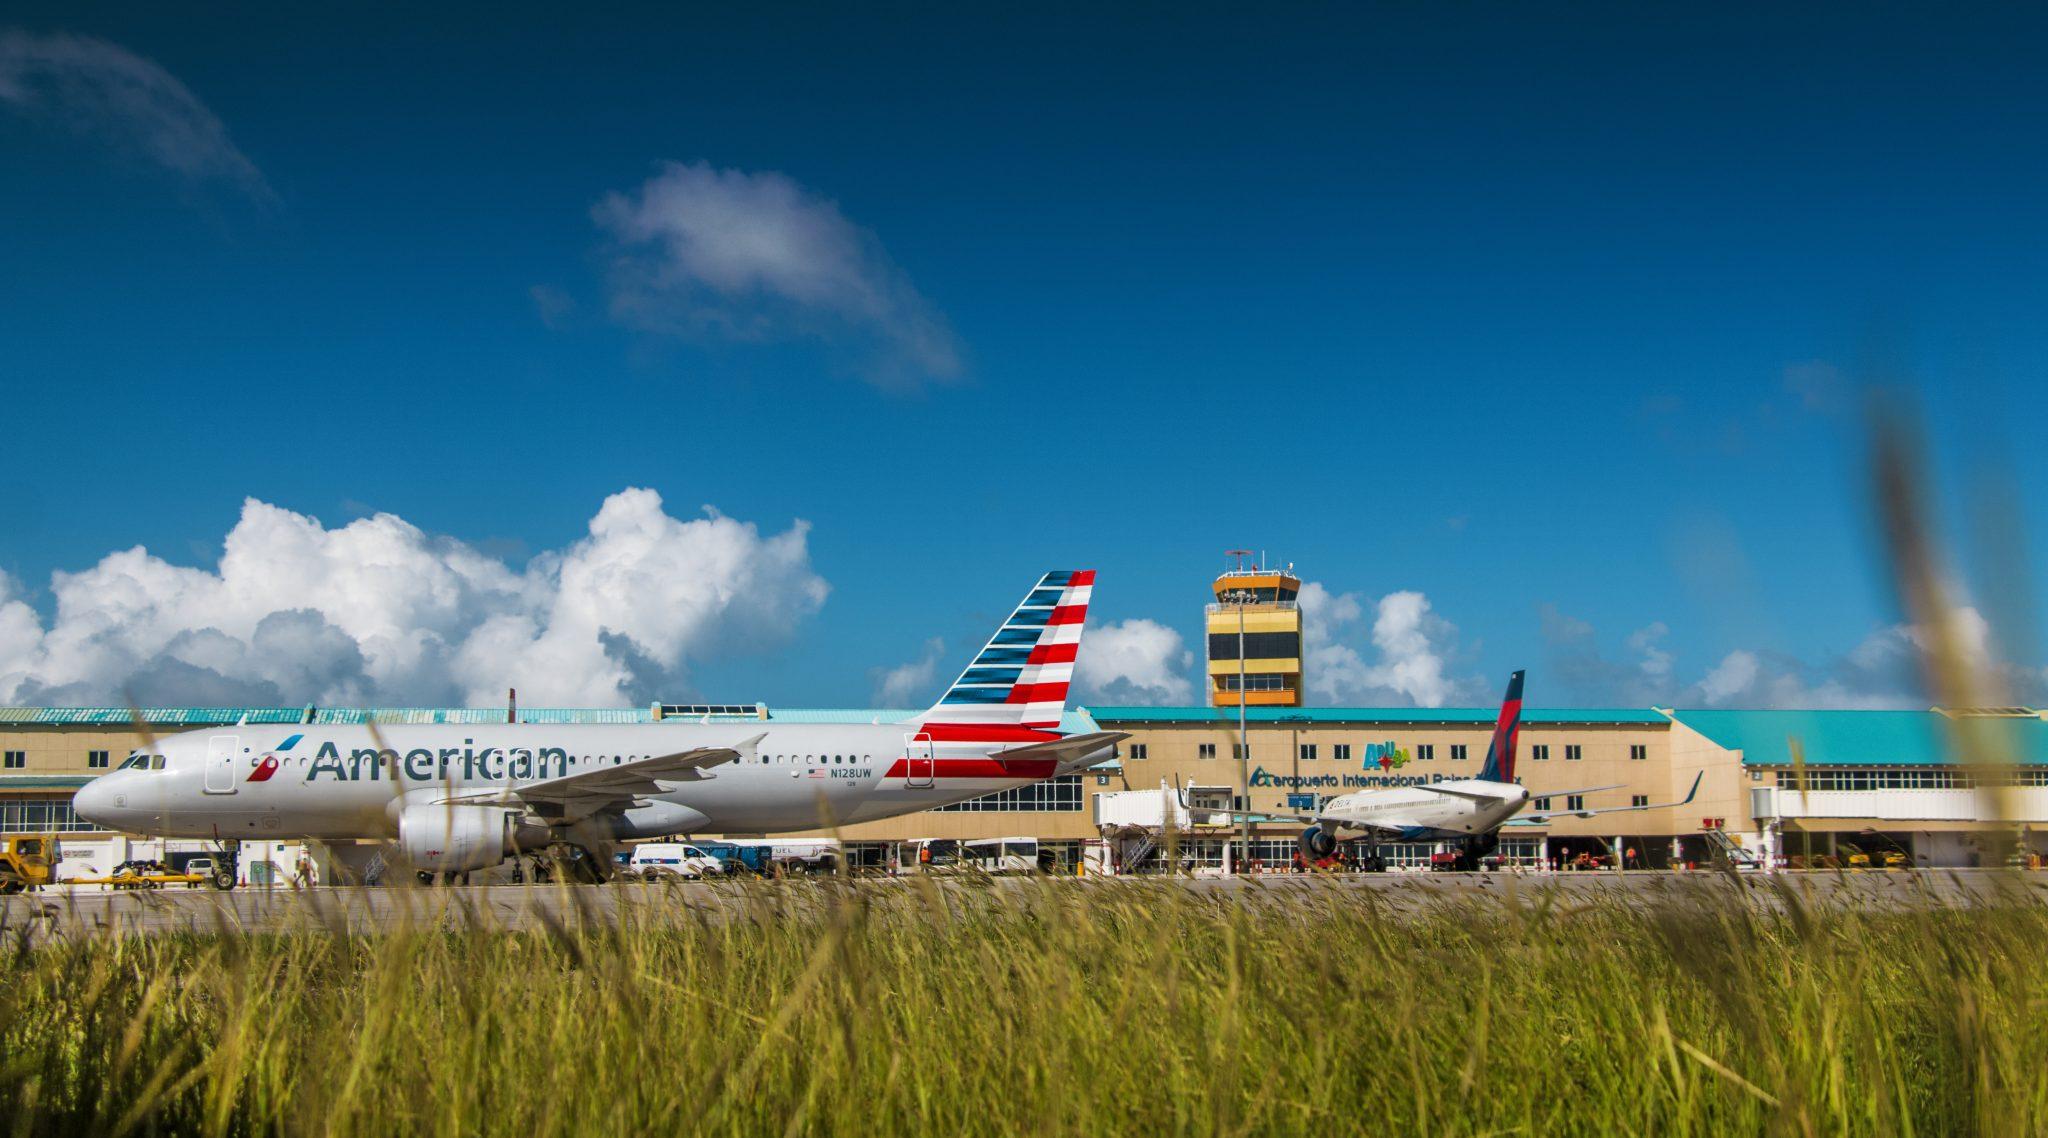 American Airlines at Aruba Airport